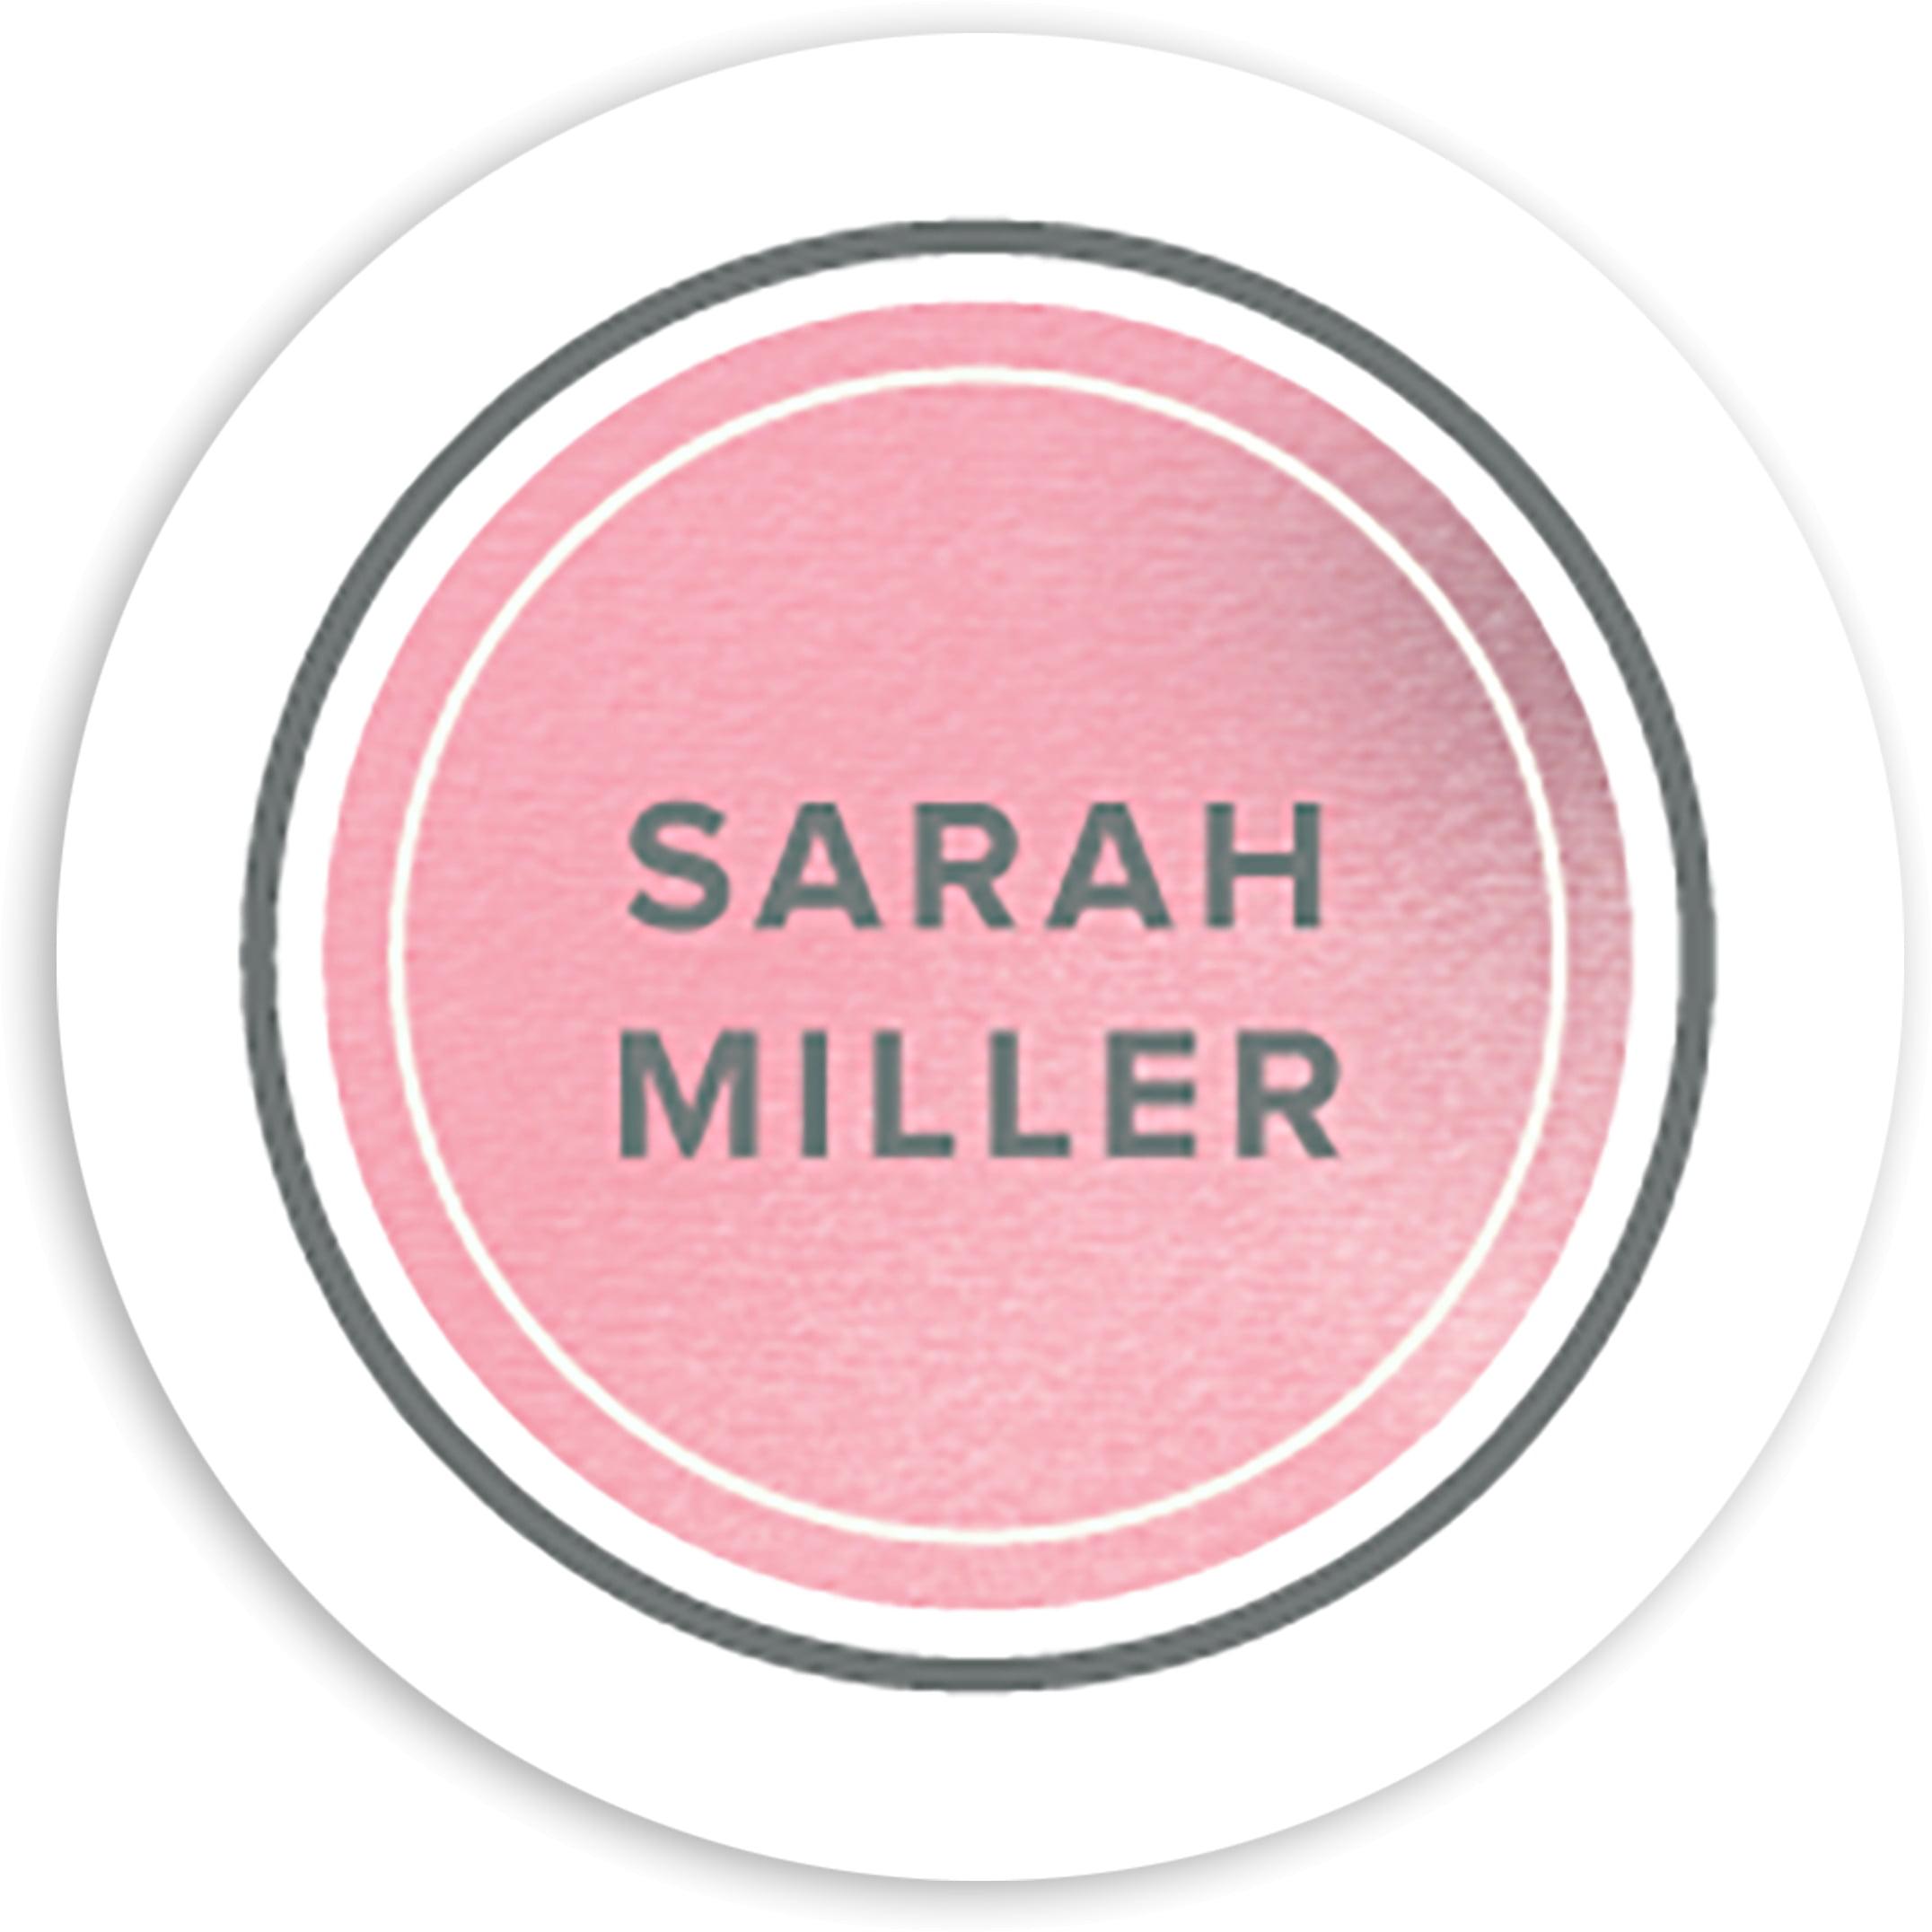 Graceful Script - Personalized 1.75 Circle Seal Sticker